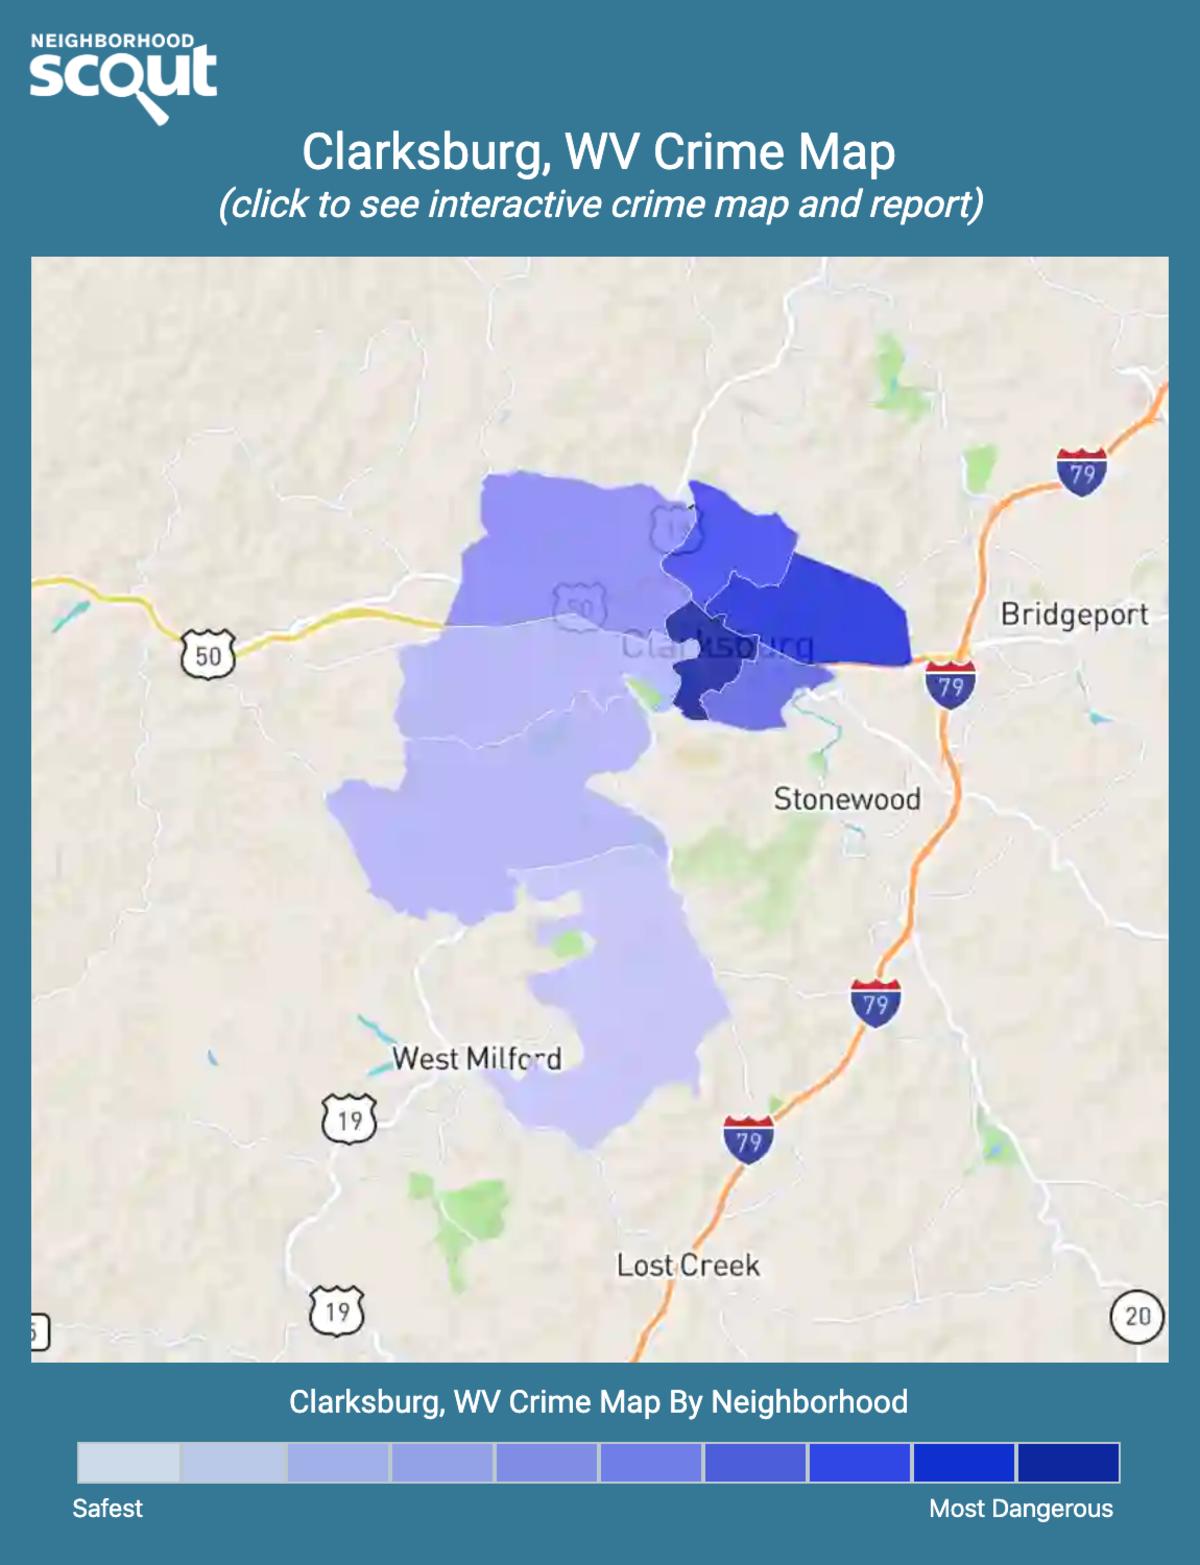 Clarksburg, West Virginia crime map